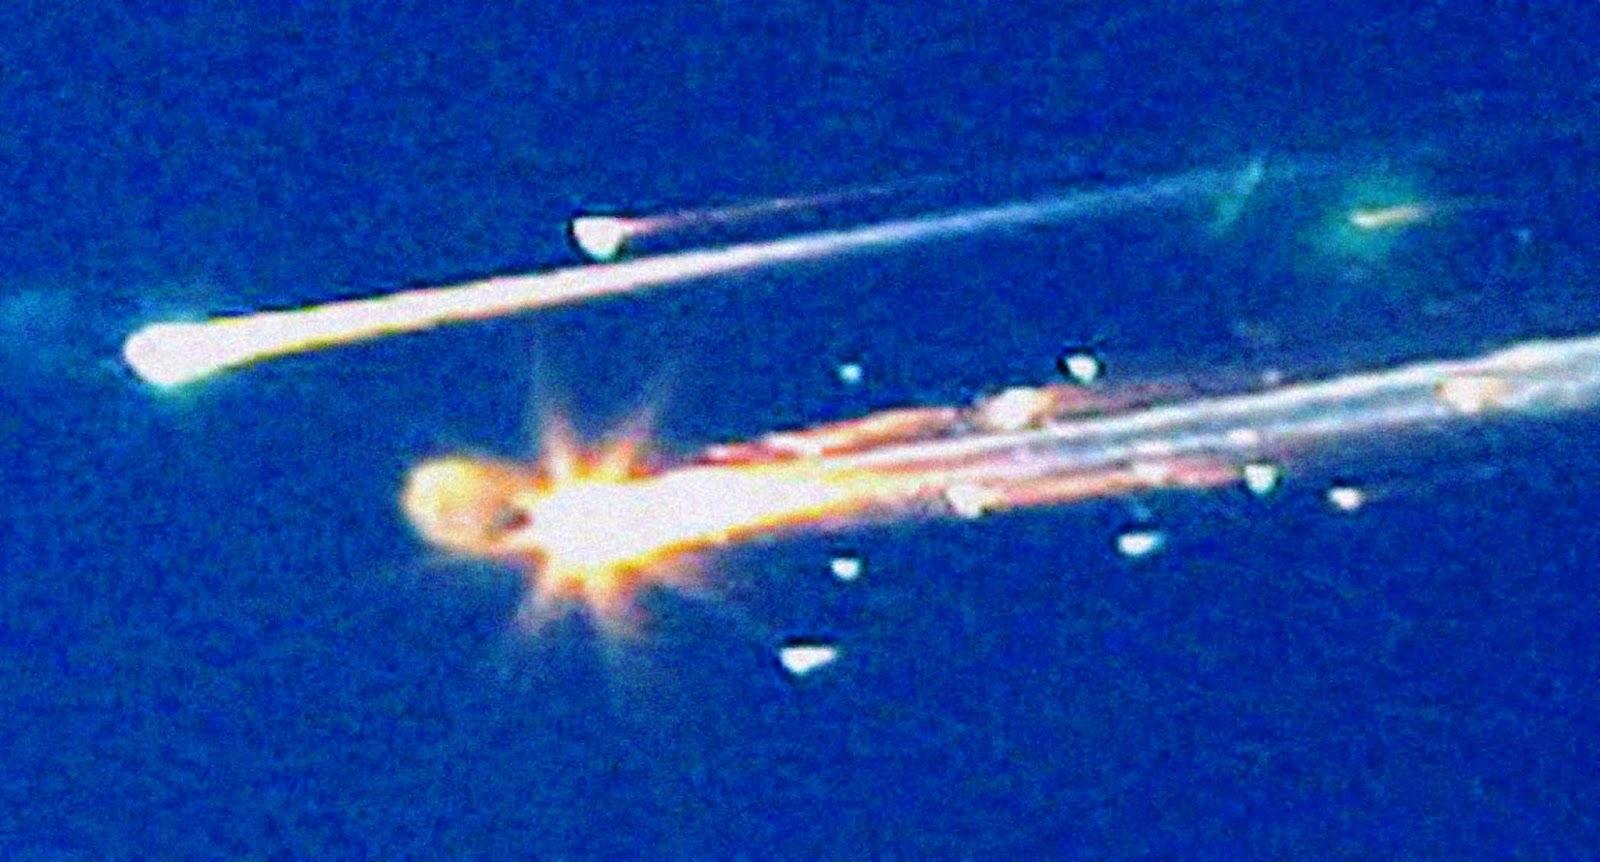 space shuttle columbia deaths - photo #21